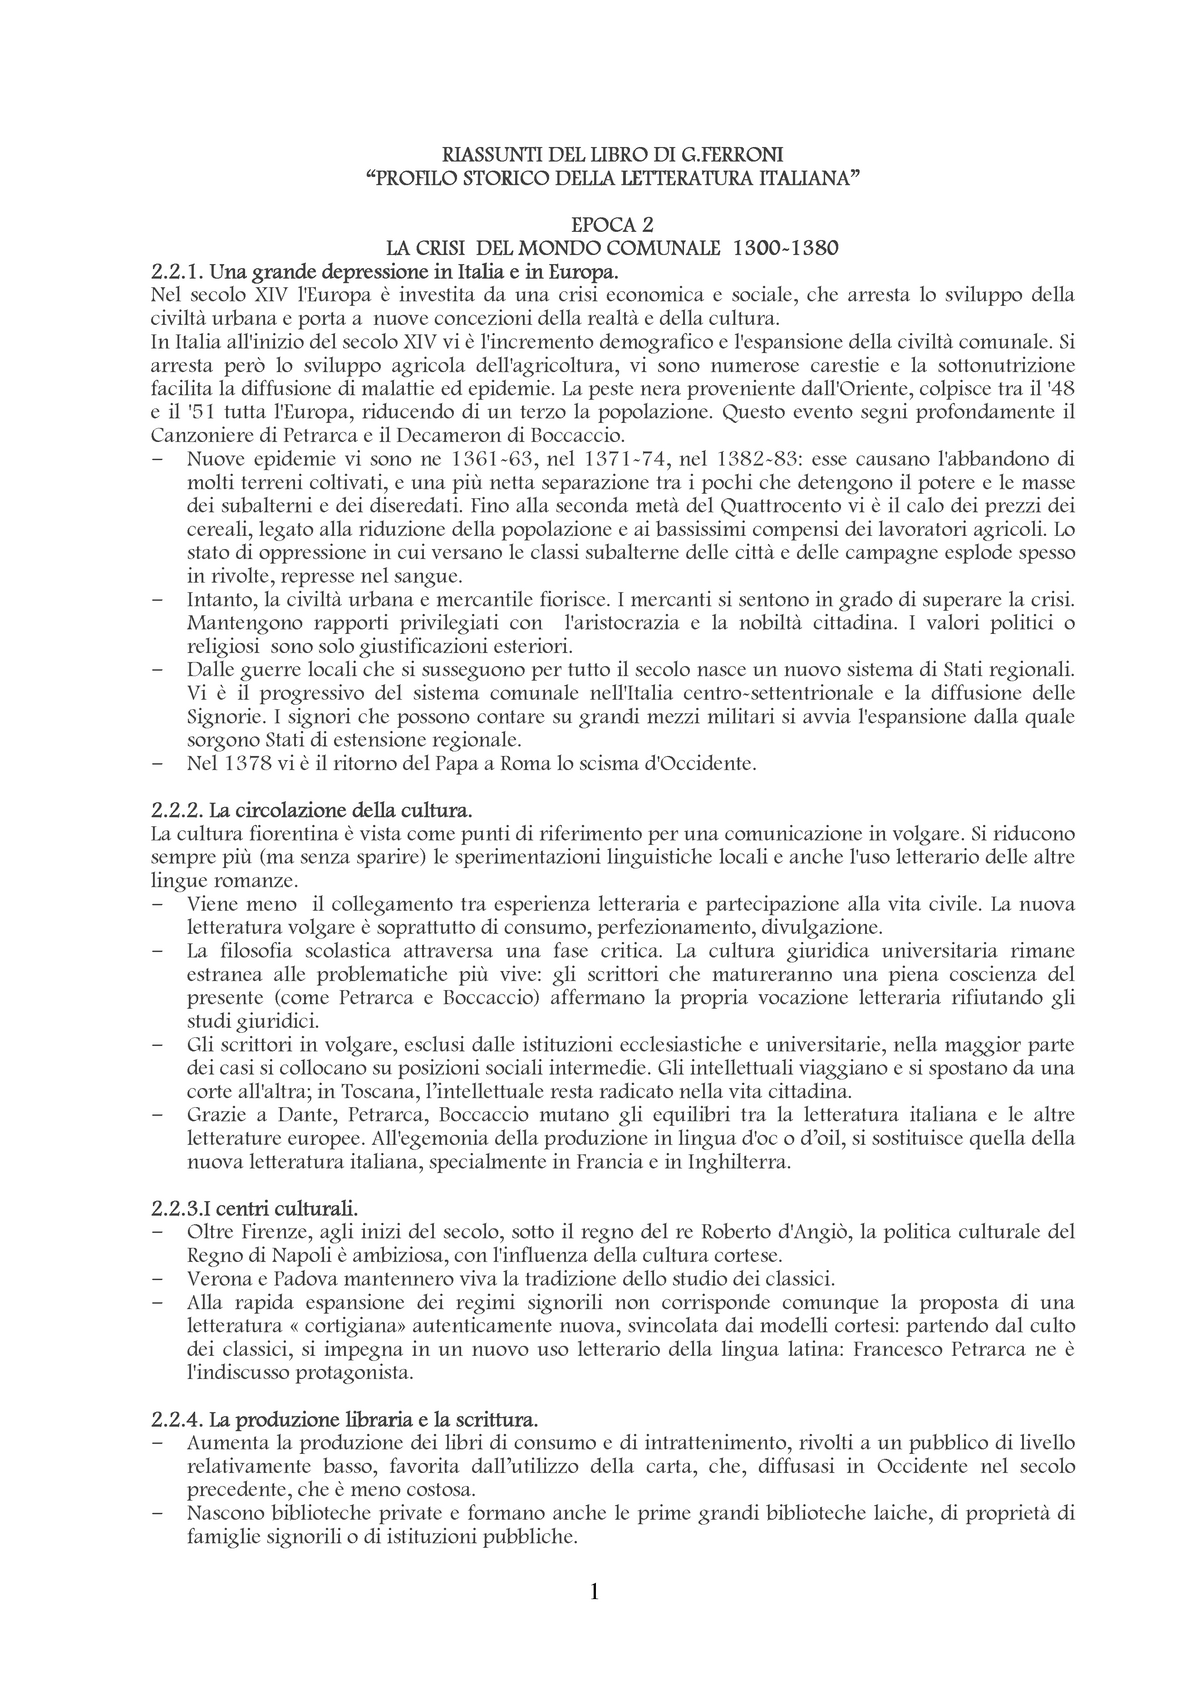 Riassunto Ferroni Vol 1 Studocu